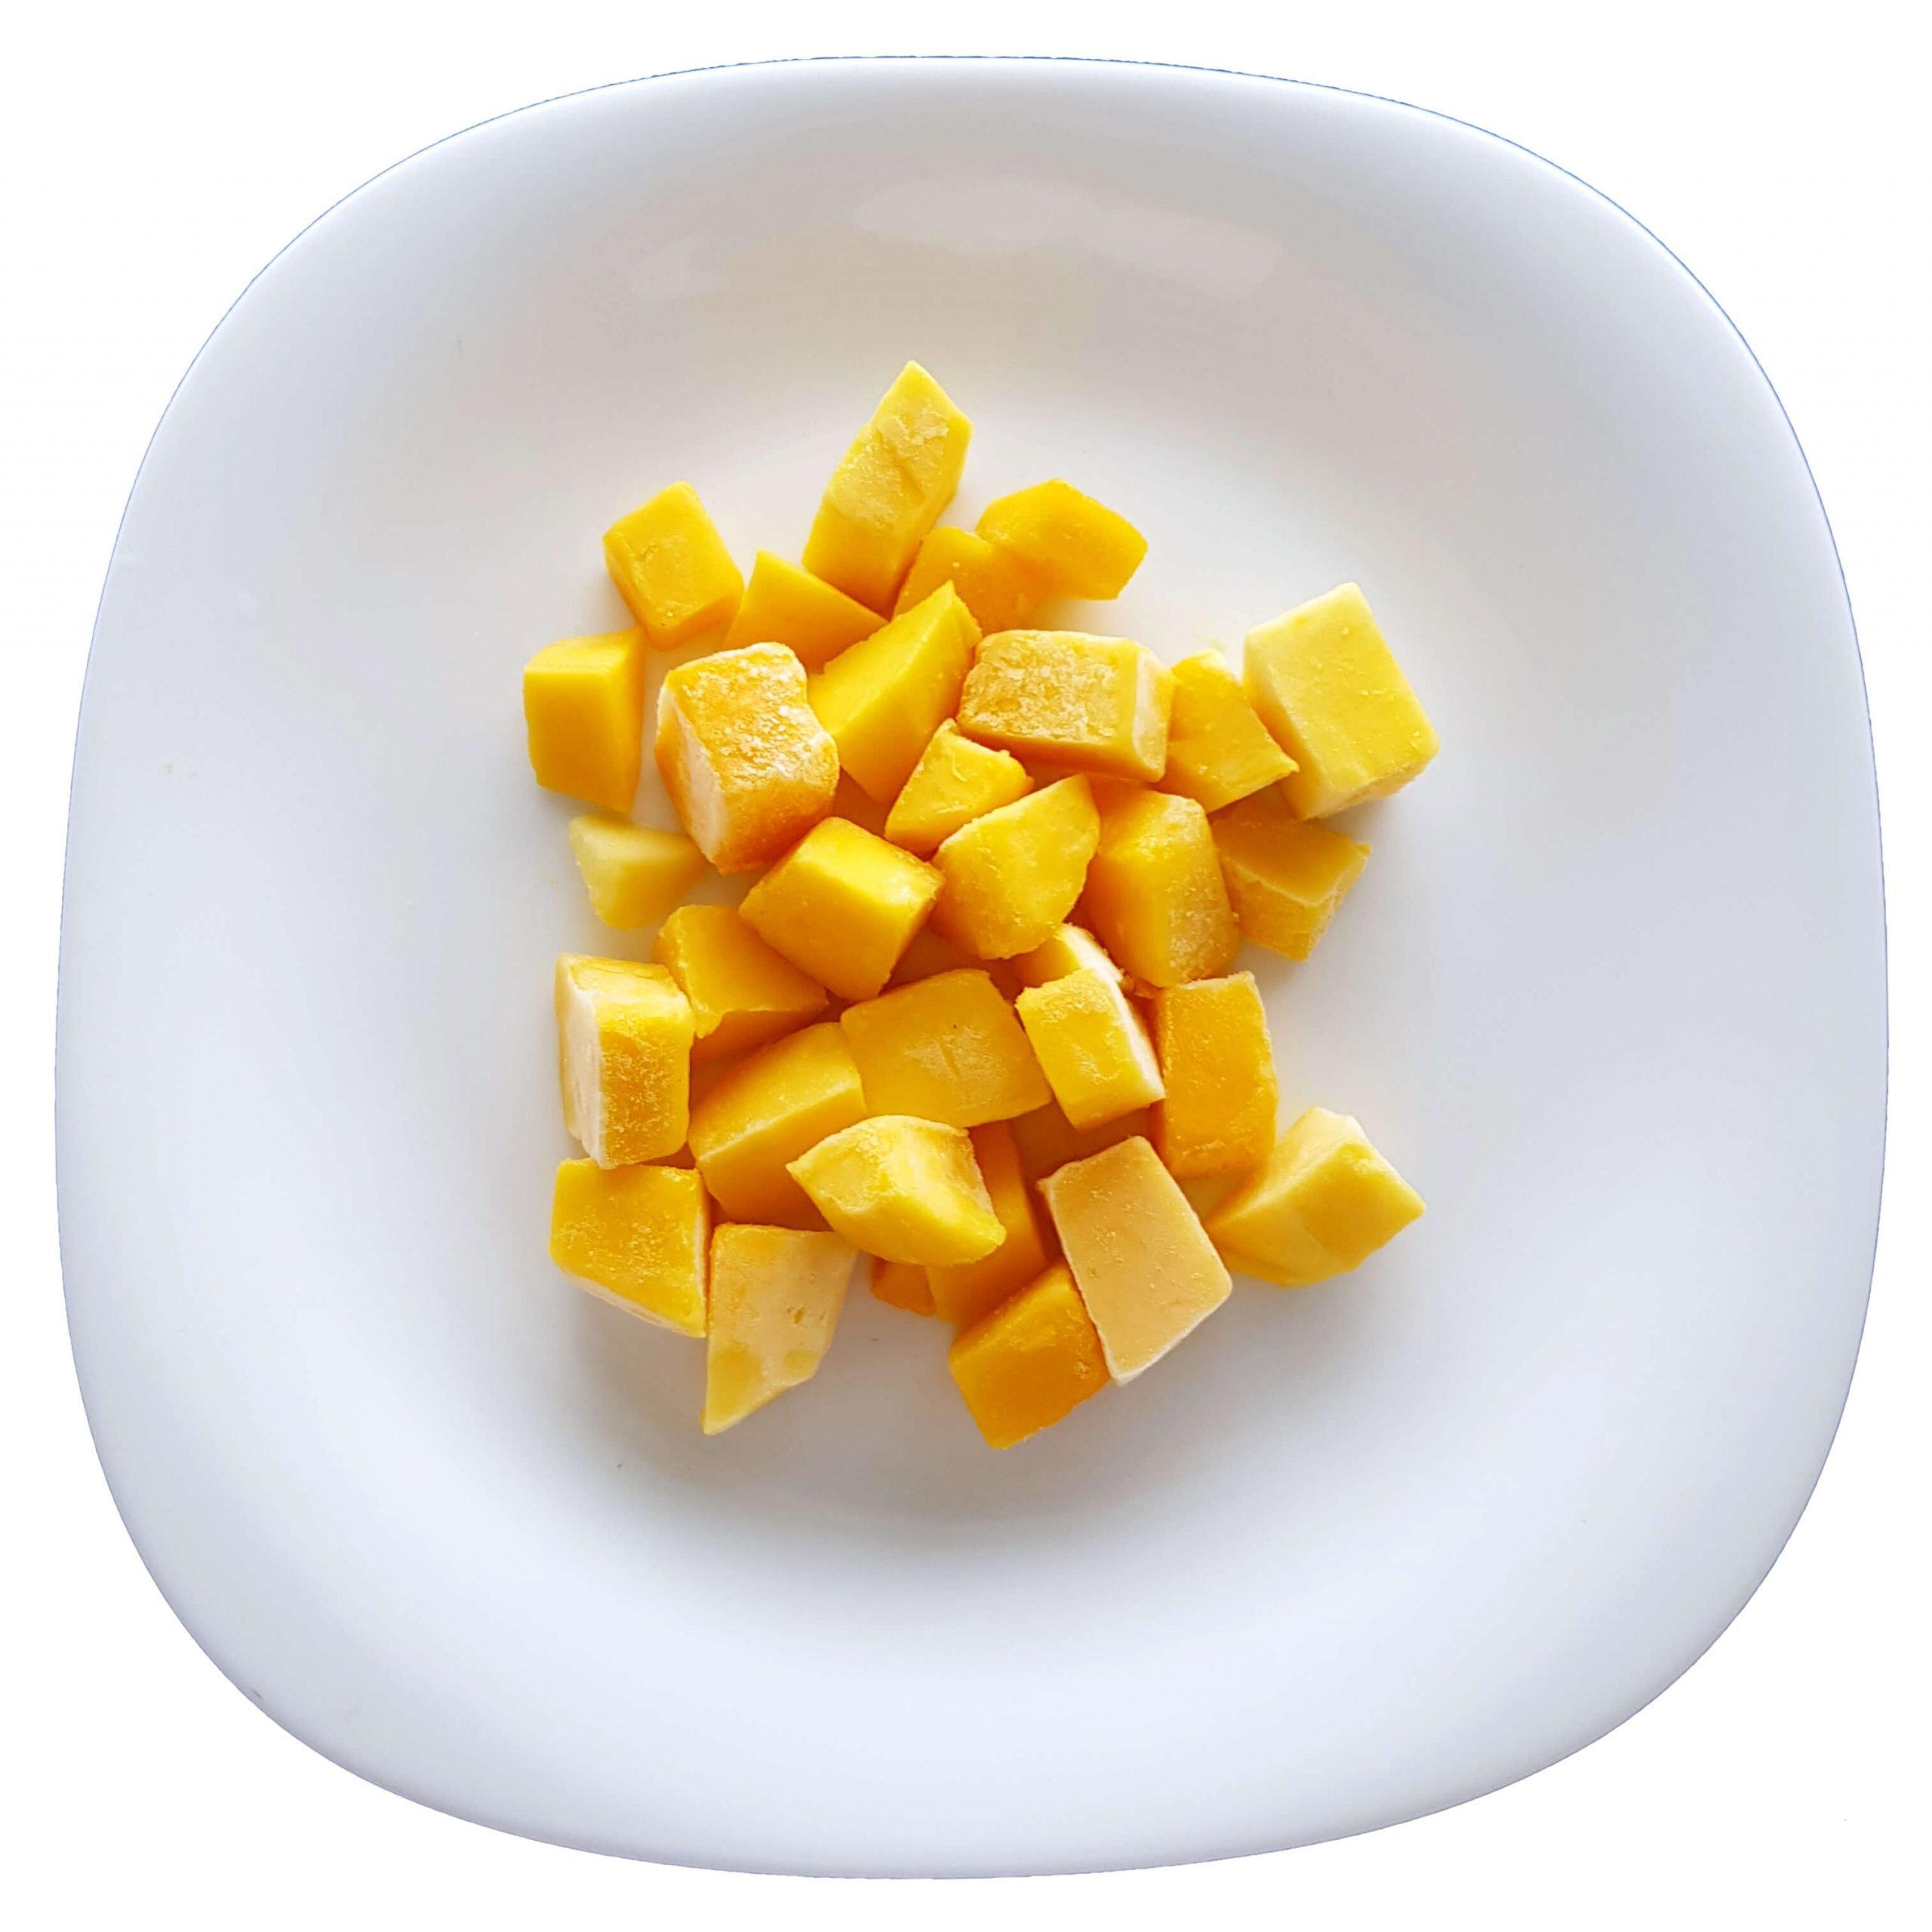 mango congelado fqf chunks